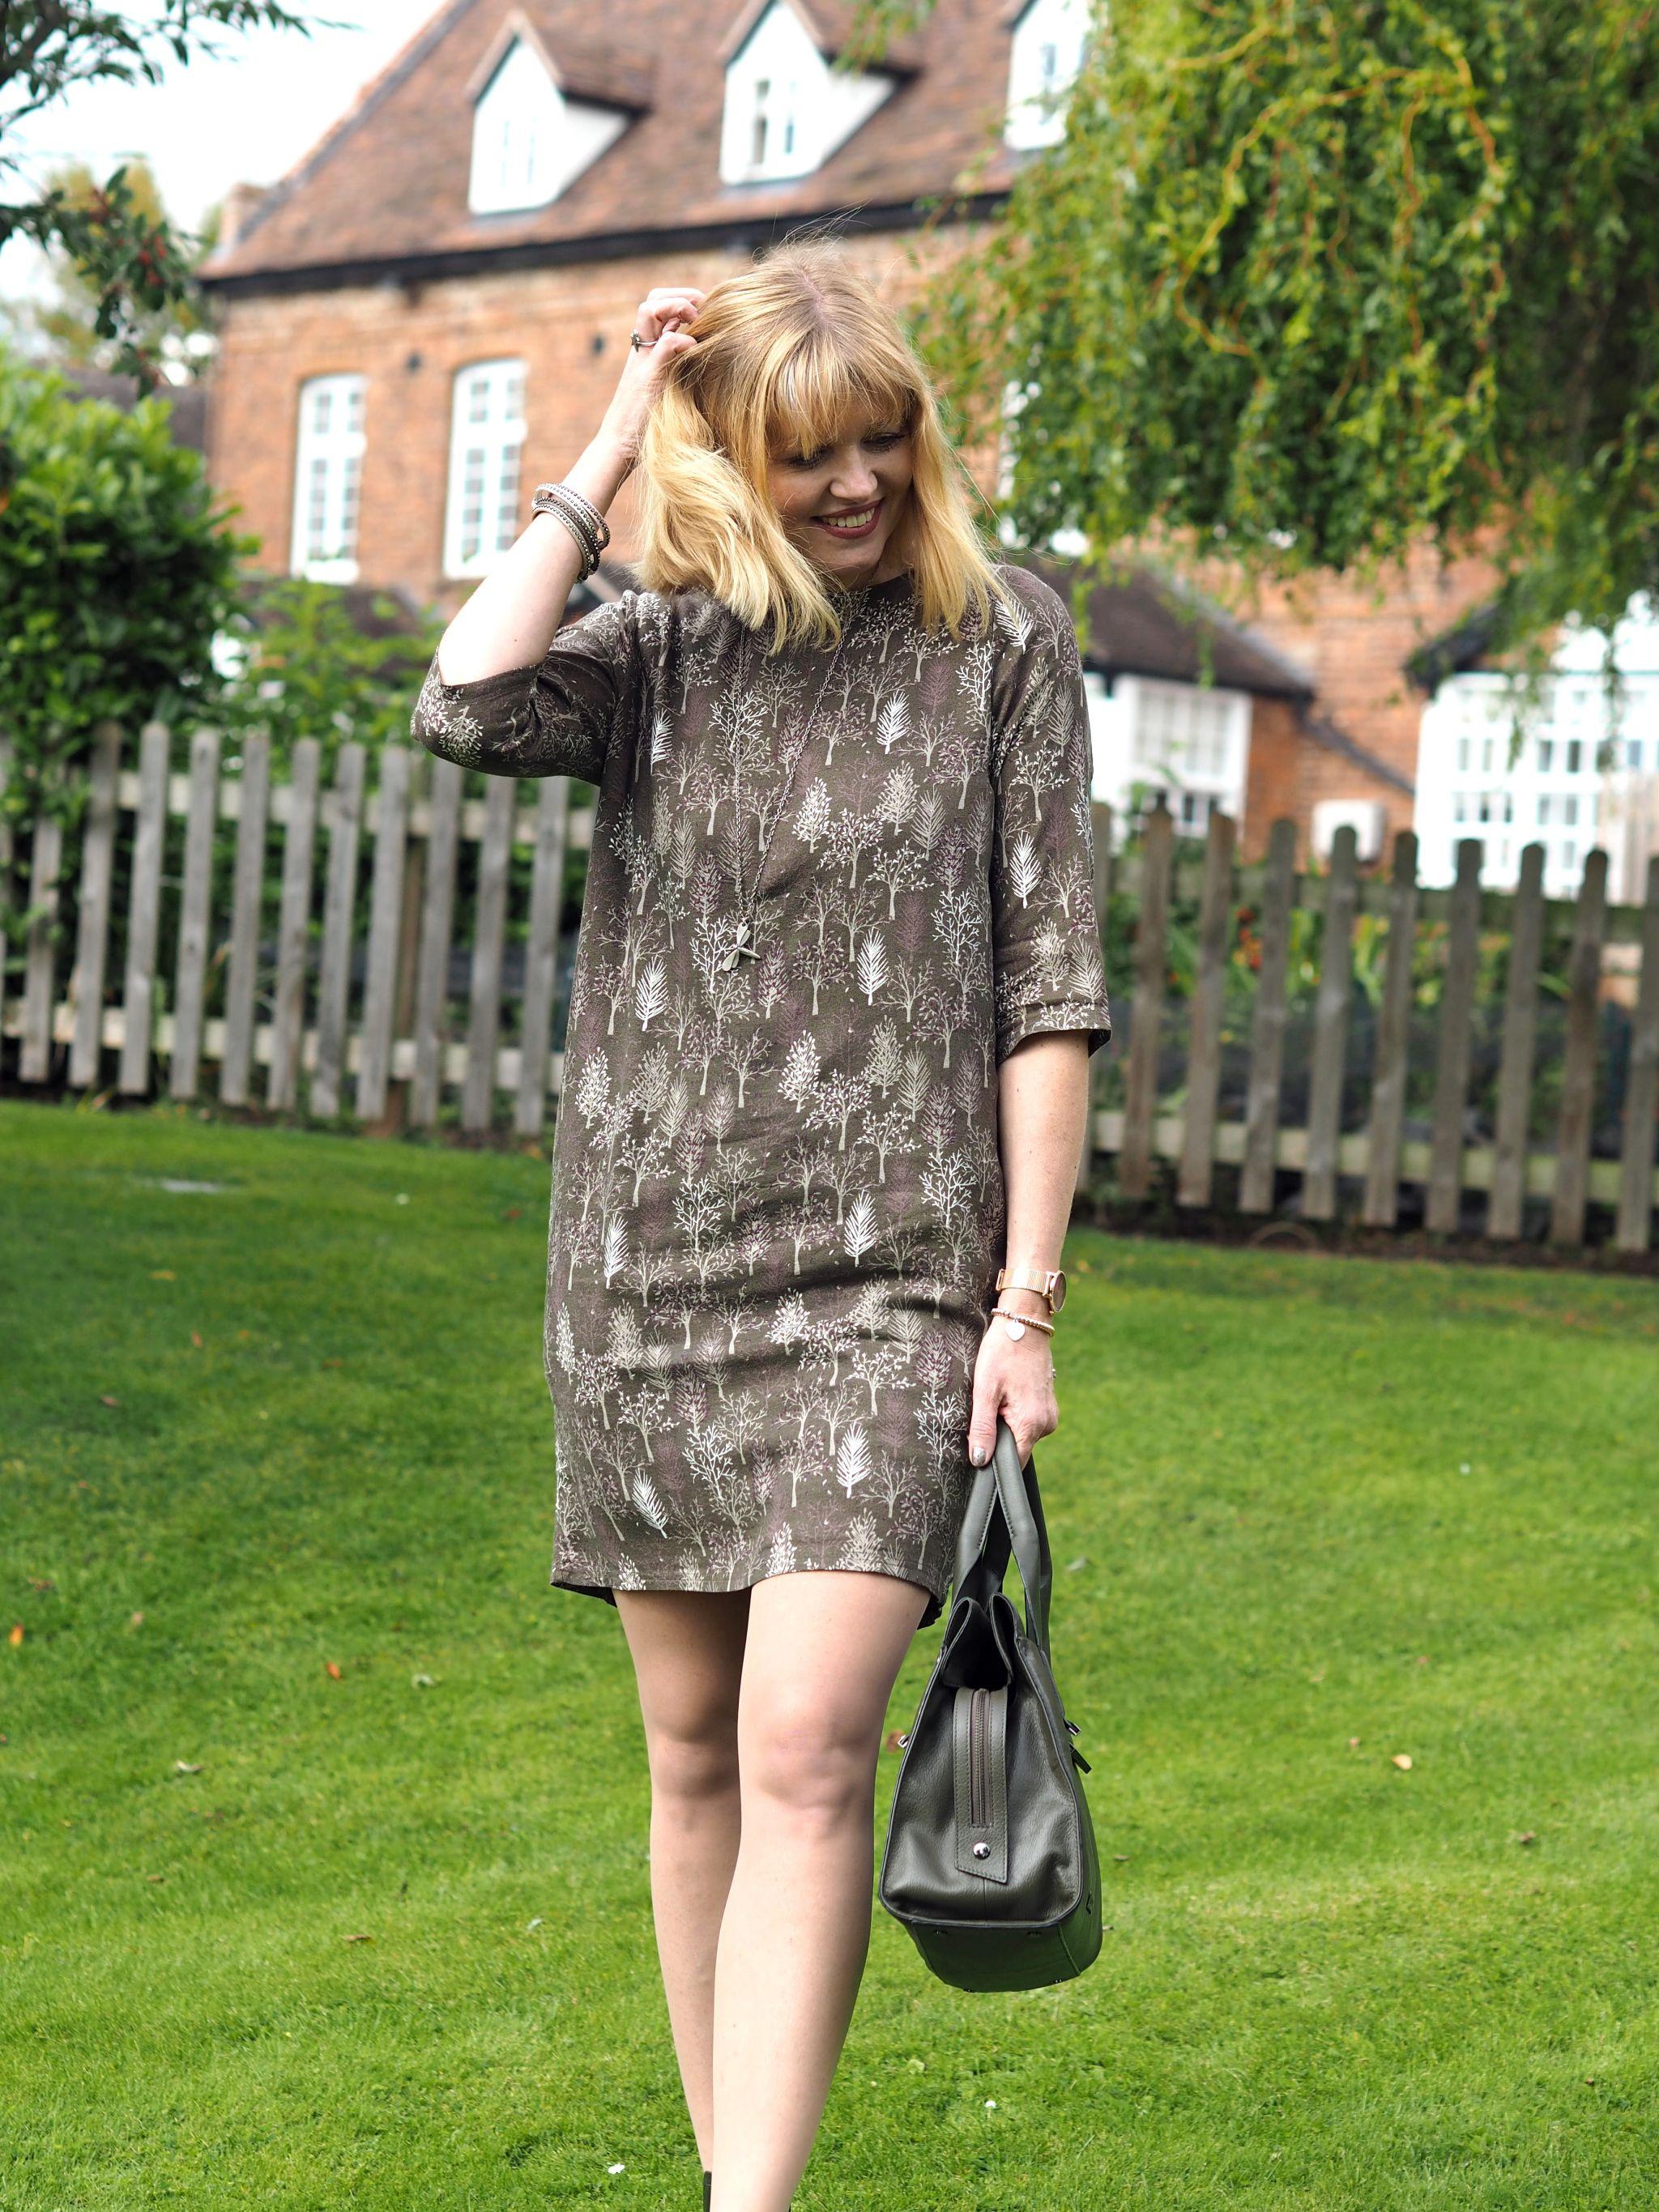 Khaki: Embracing Autumn With A Khaki Dress, A Khaki Bag and Chelsea Boots